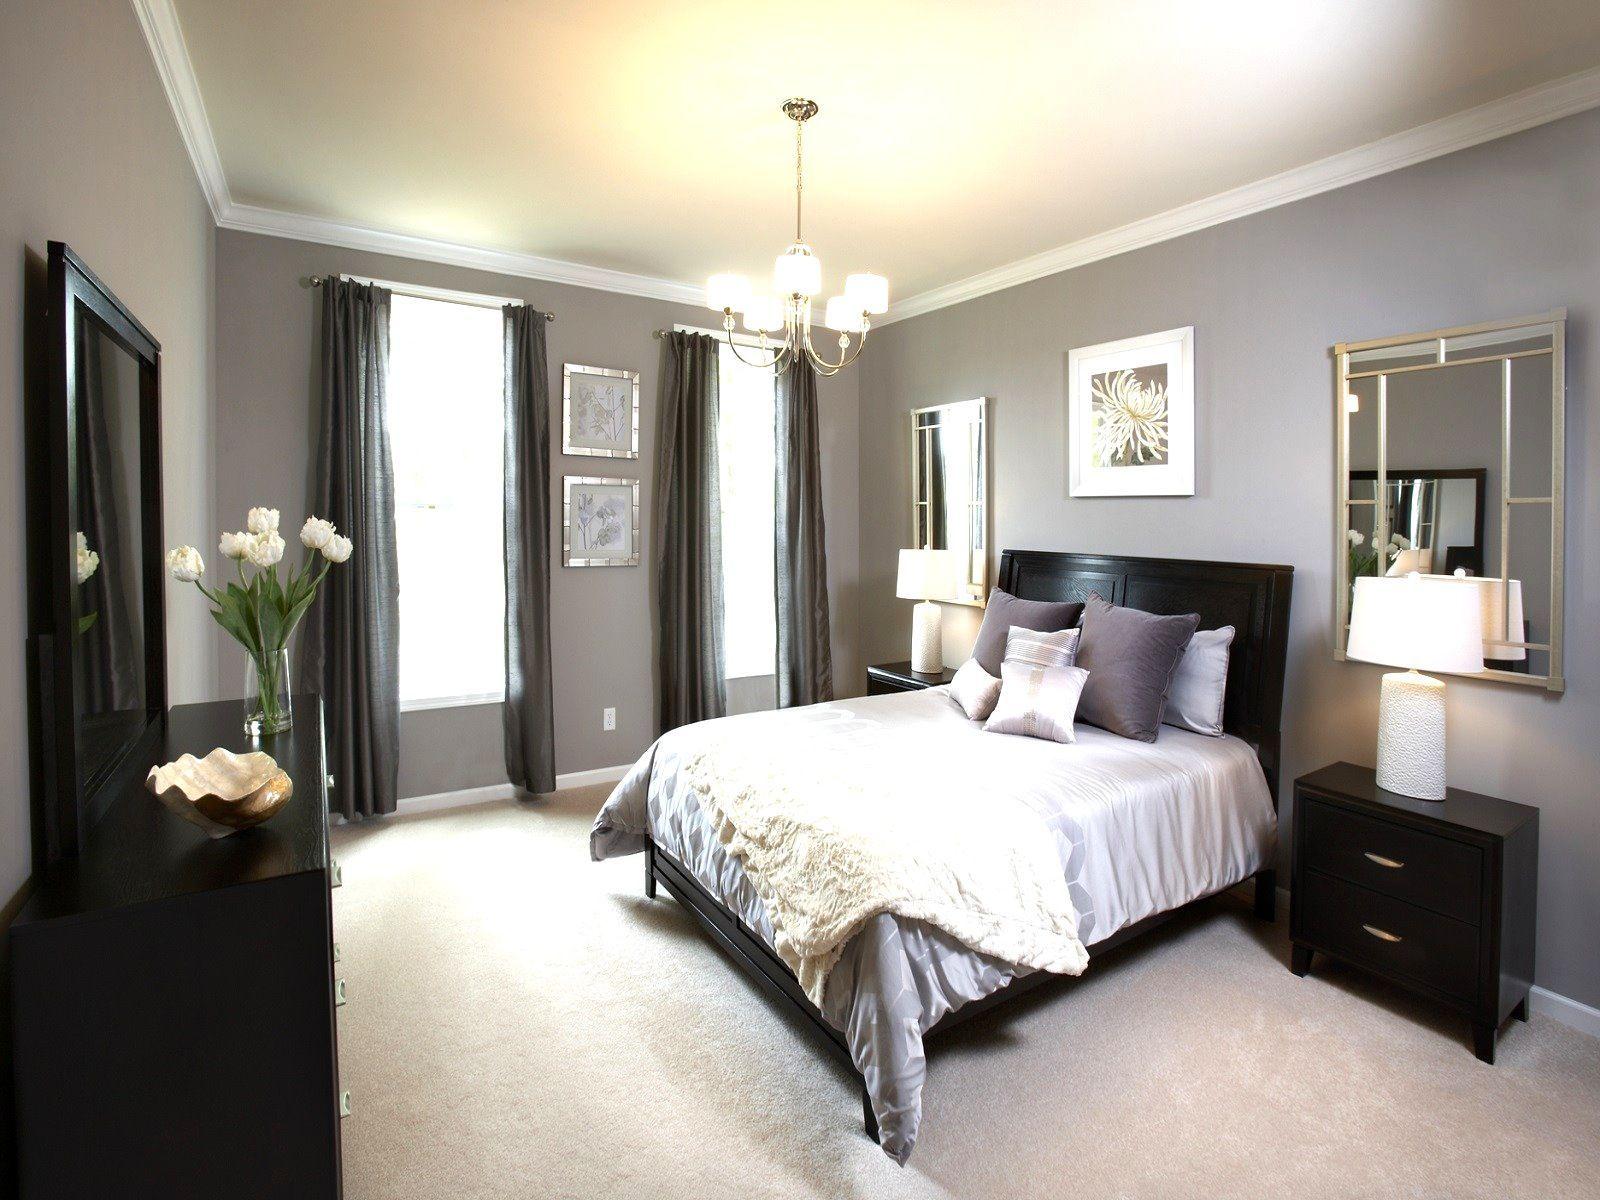 Bedroom area rug ideas luxury bedroom grey carpet bedroom area rug